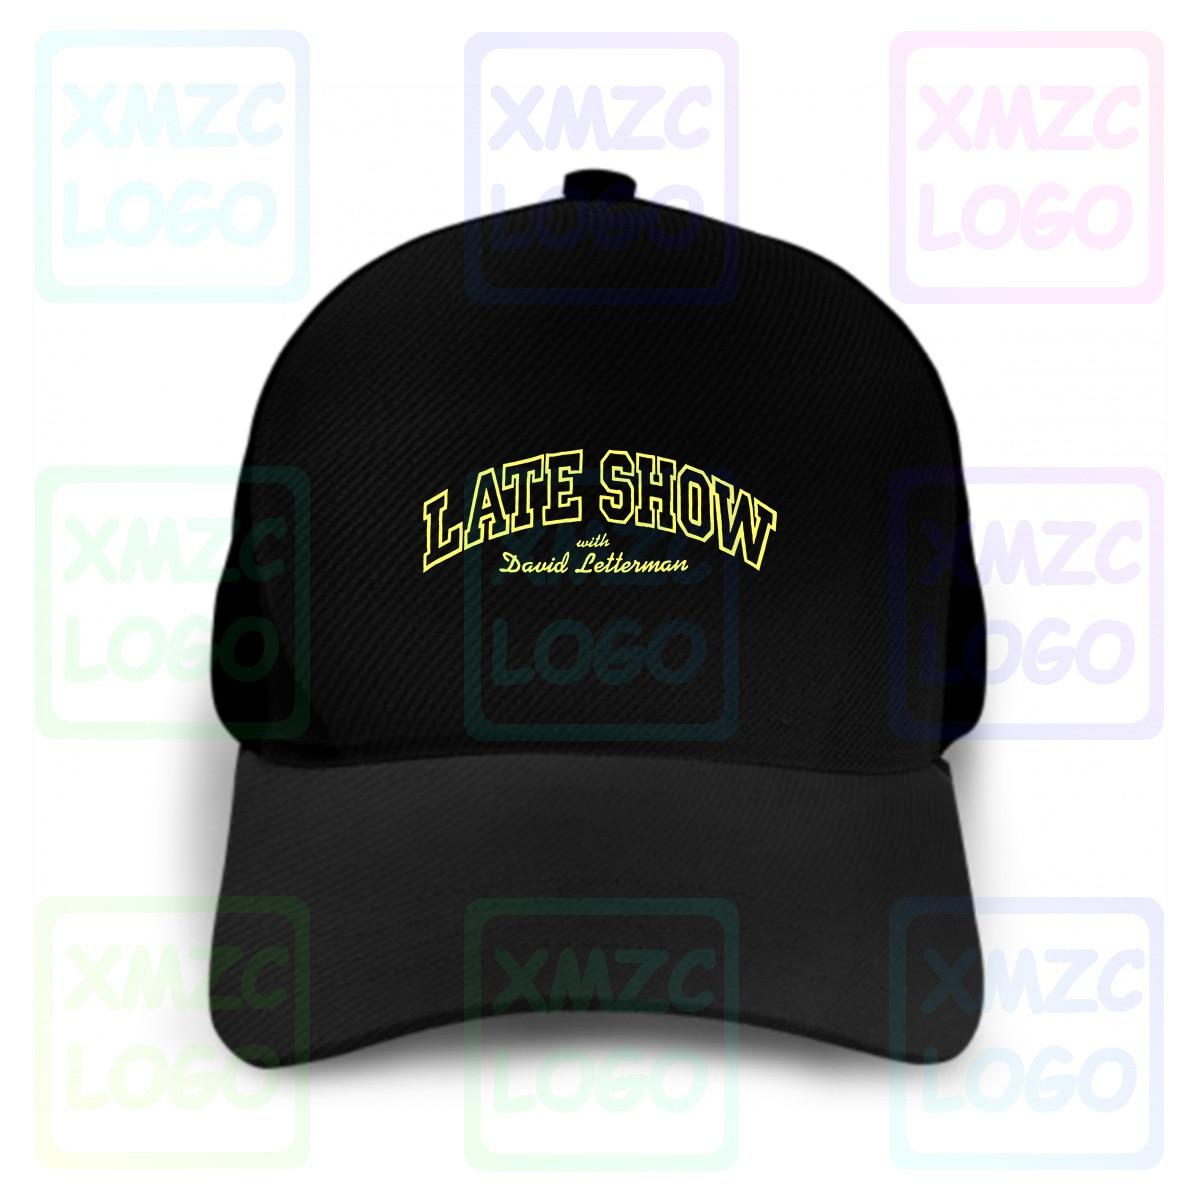 Vintage 90S David Letterman Late Show gorra de béisbol Tv Show promocional divertido Hombre talla Xl